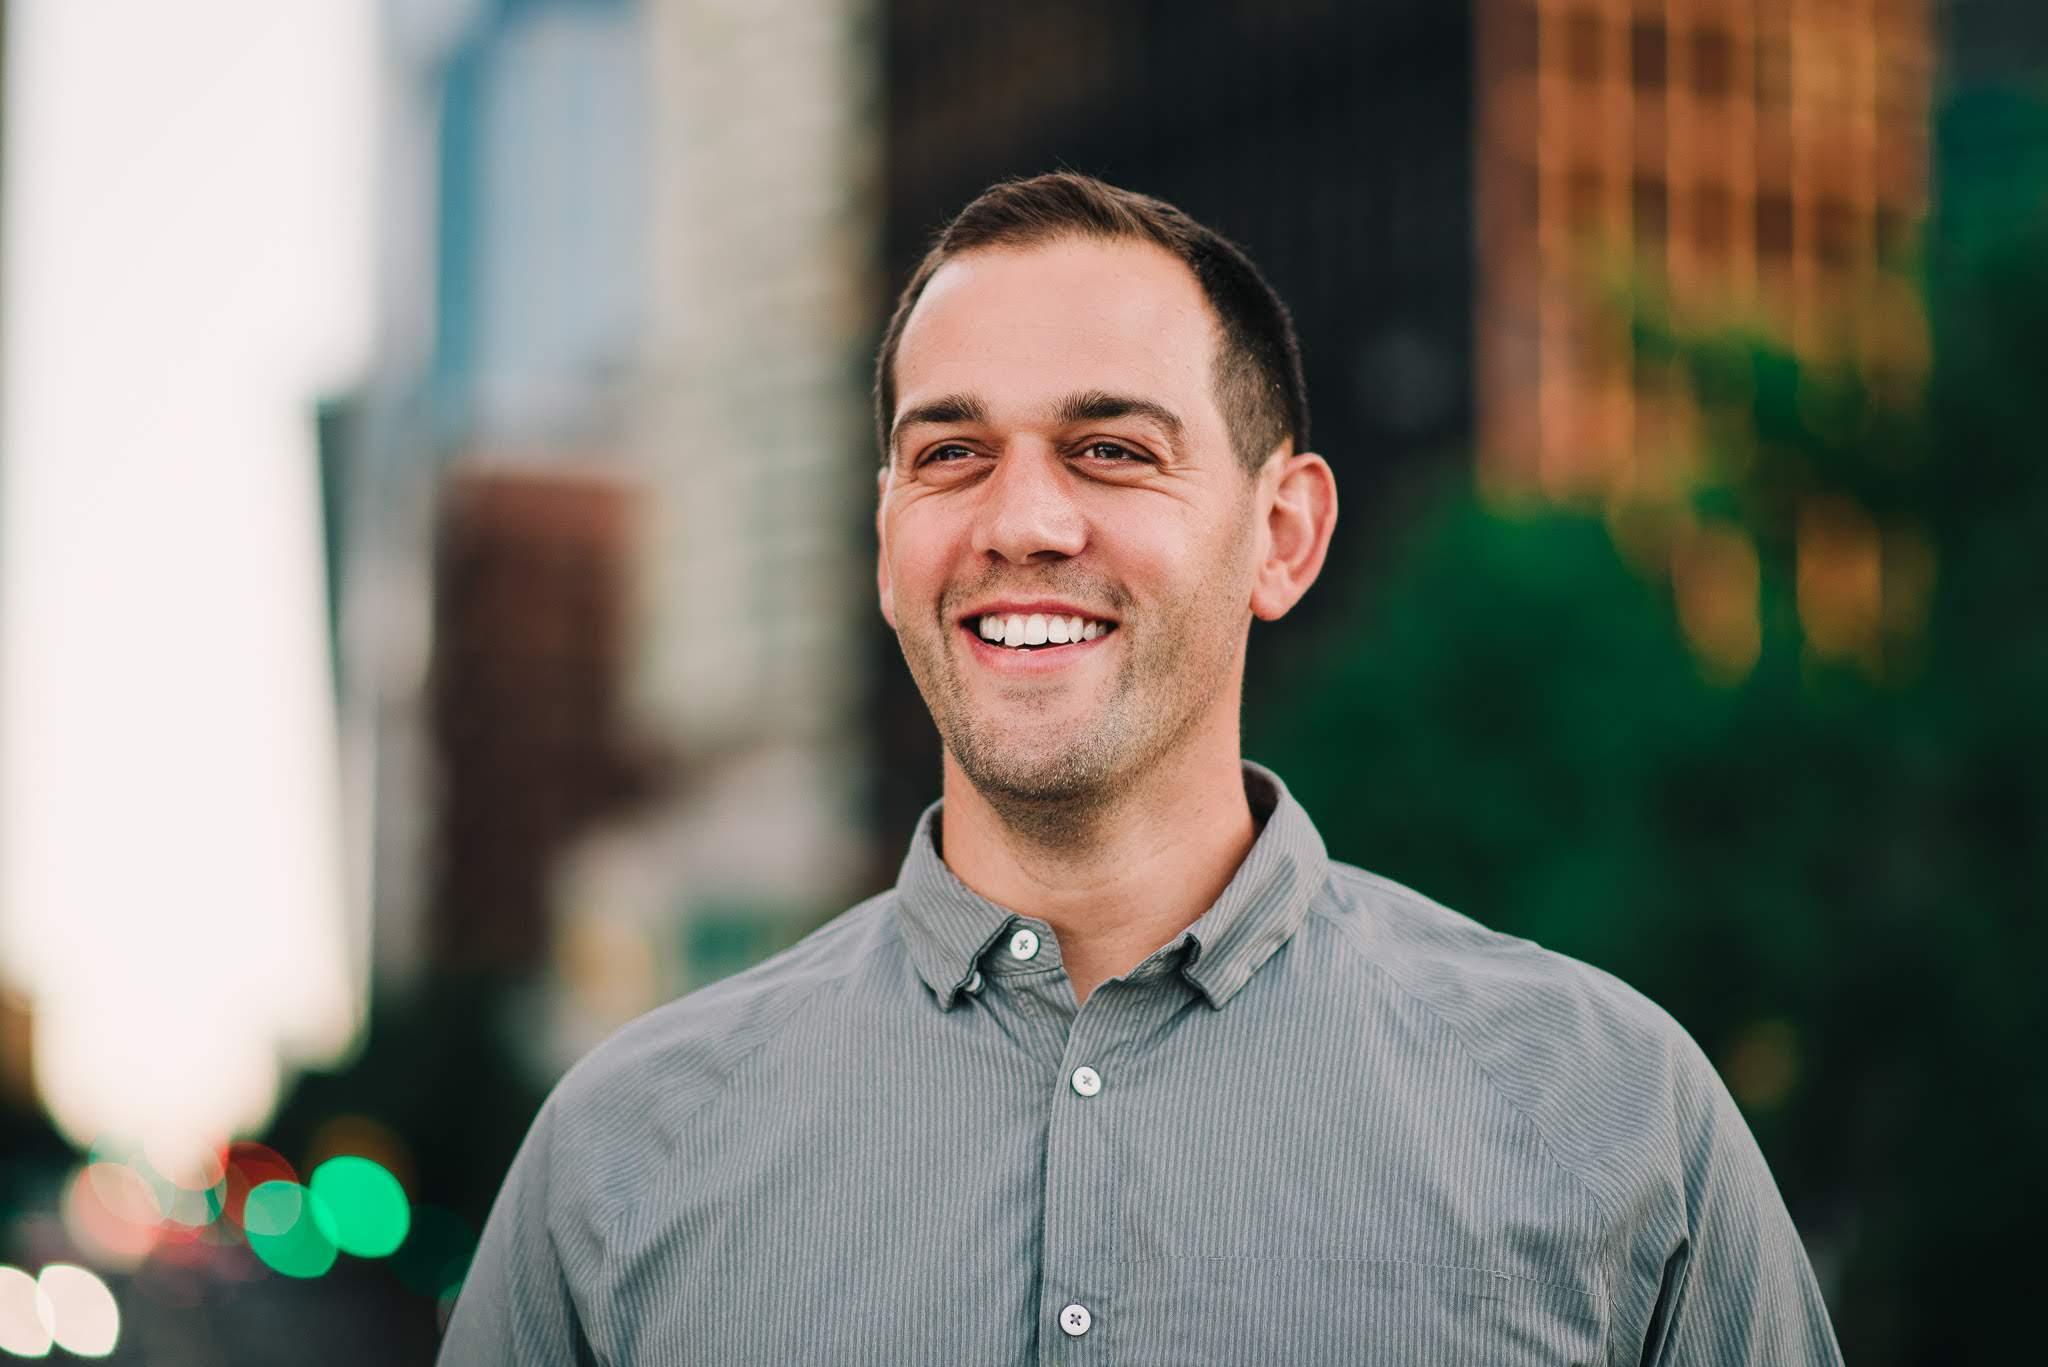 Ben Aston online entrepreneur